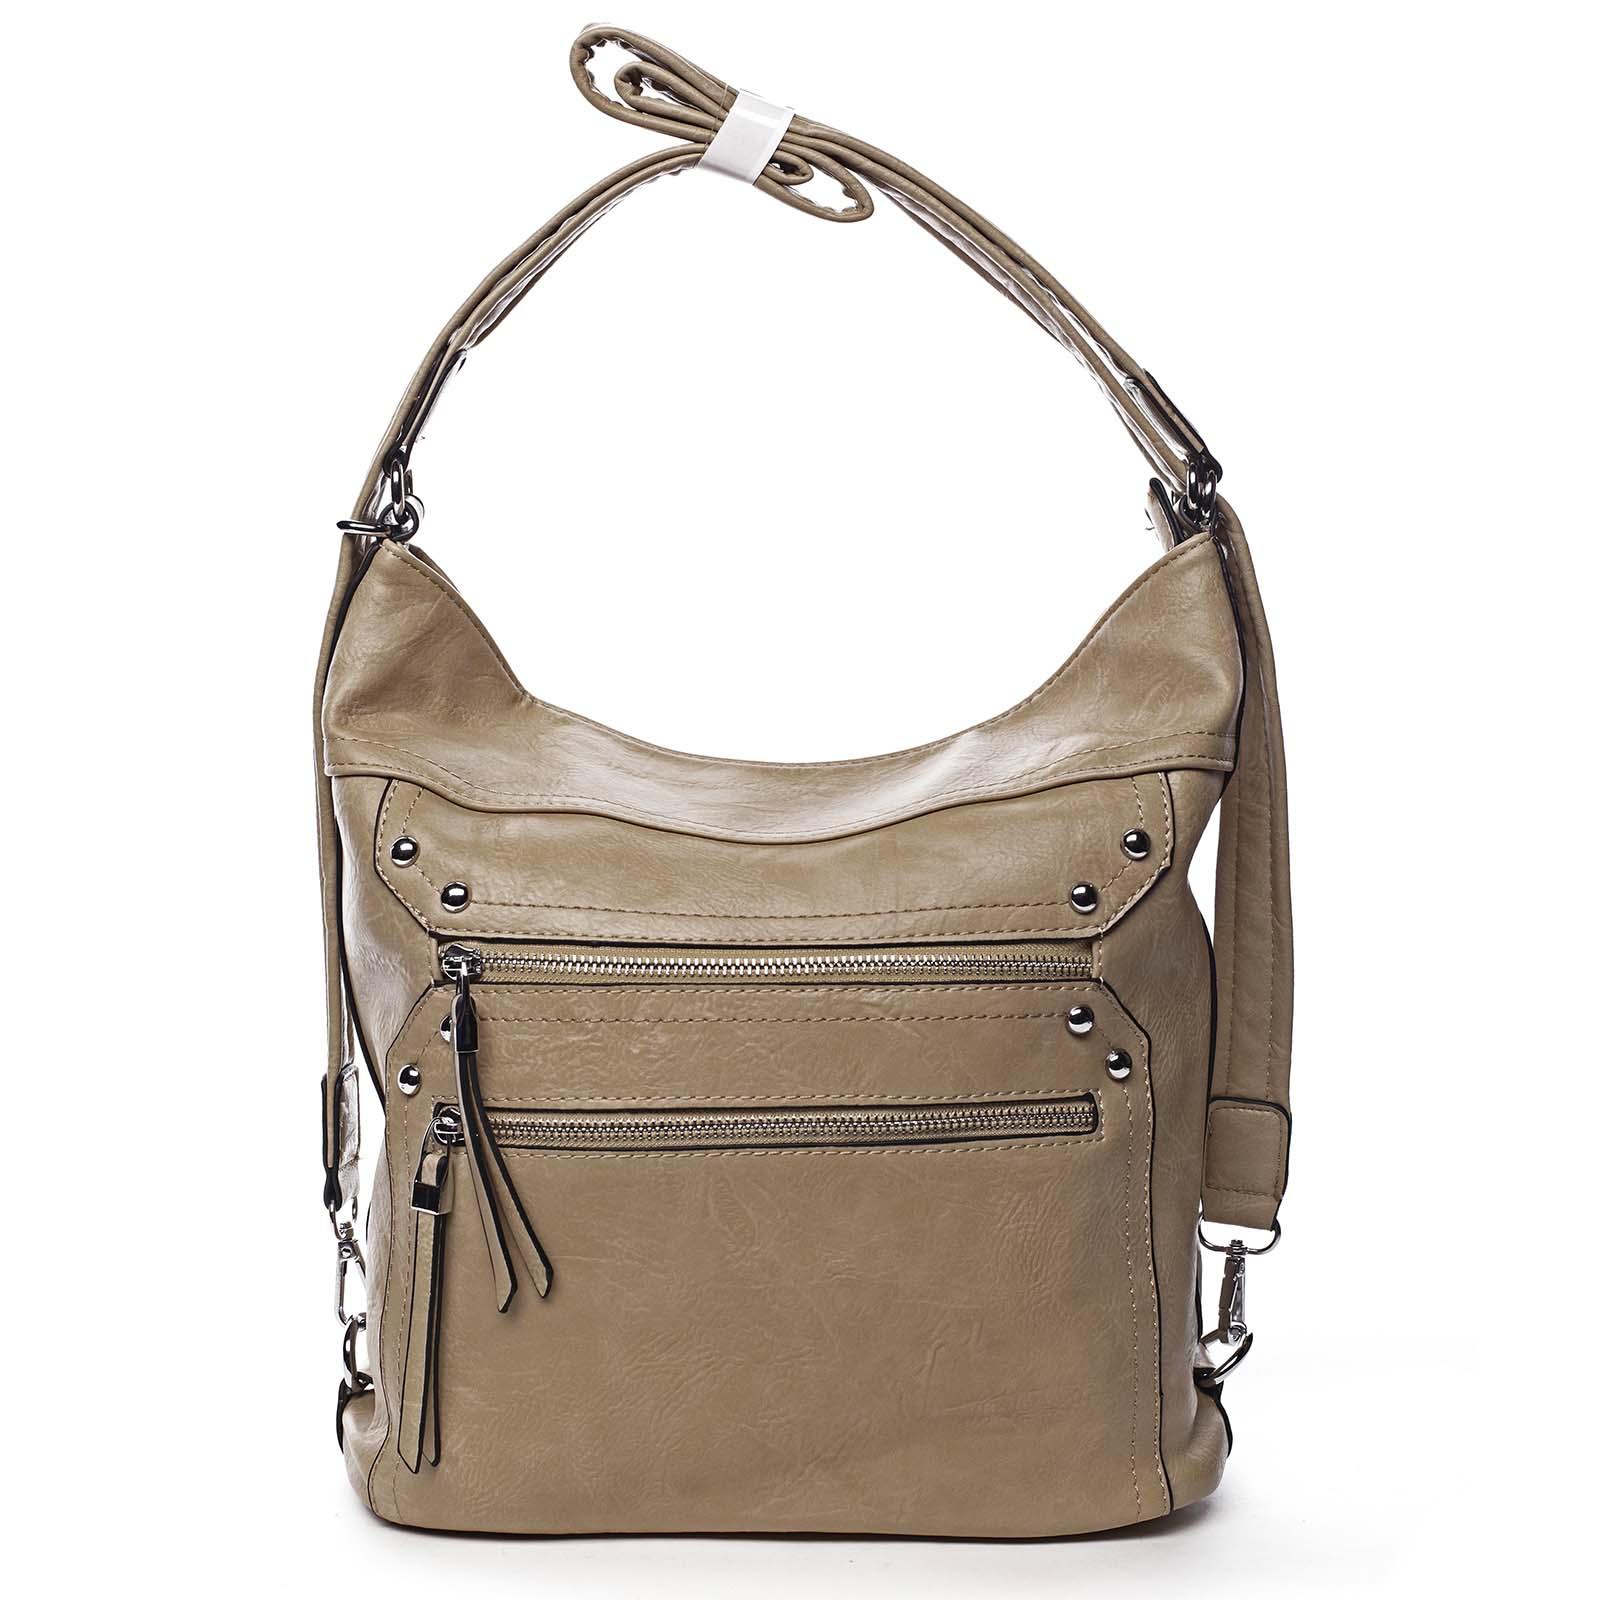 Dámská kabelka batoh tmavě béžová - Romina Alfa